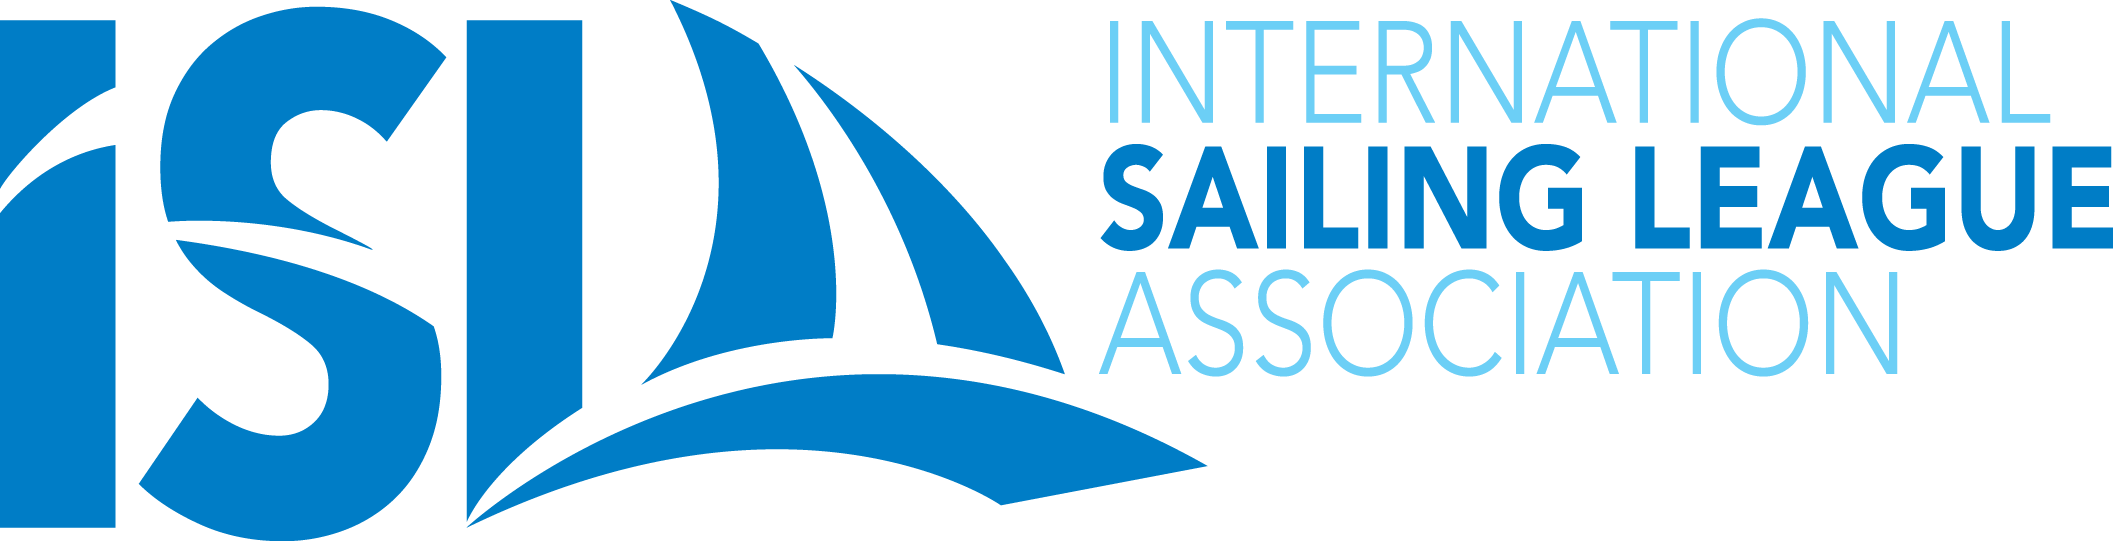 International Sailing League Association